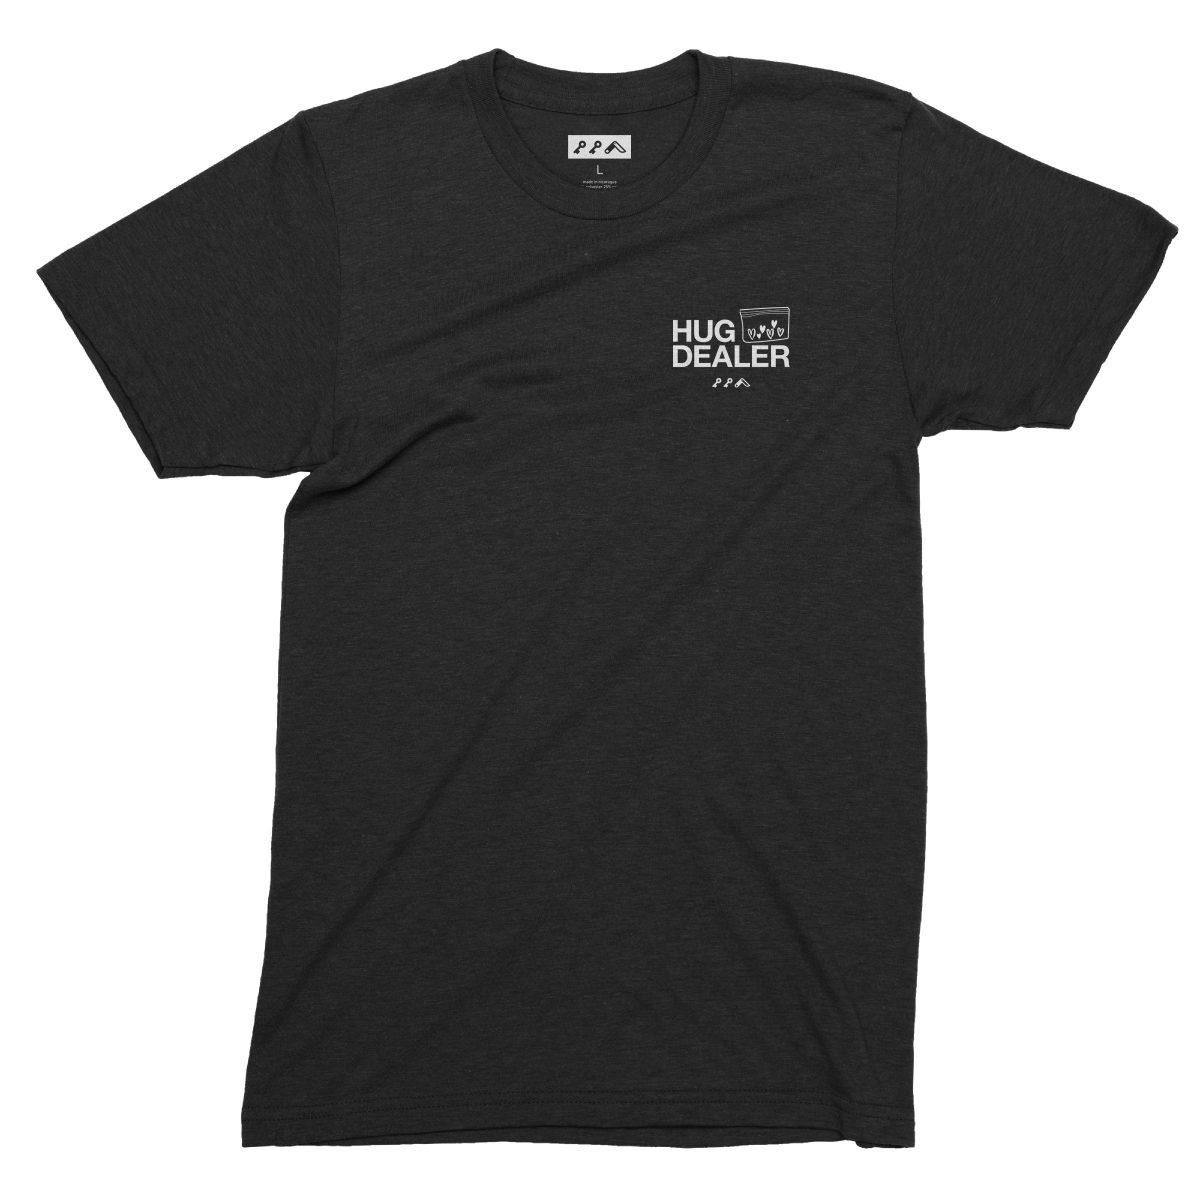 HUG DEALER shirt in black by kikicutt t-shirt store